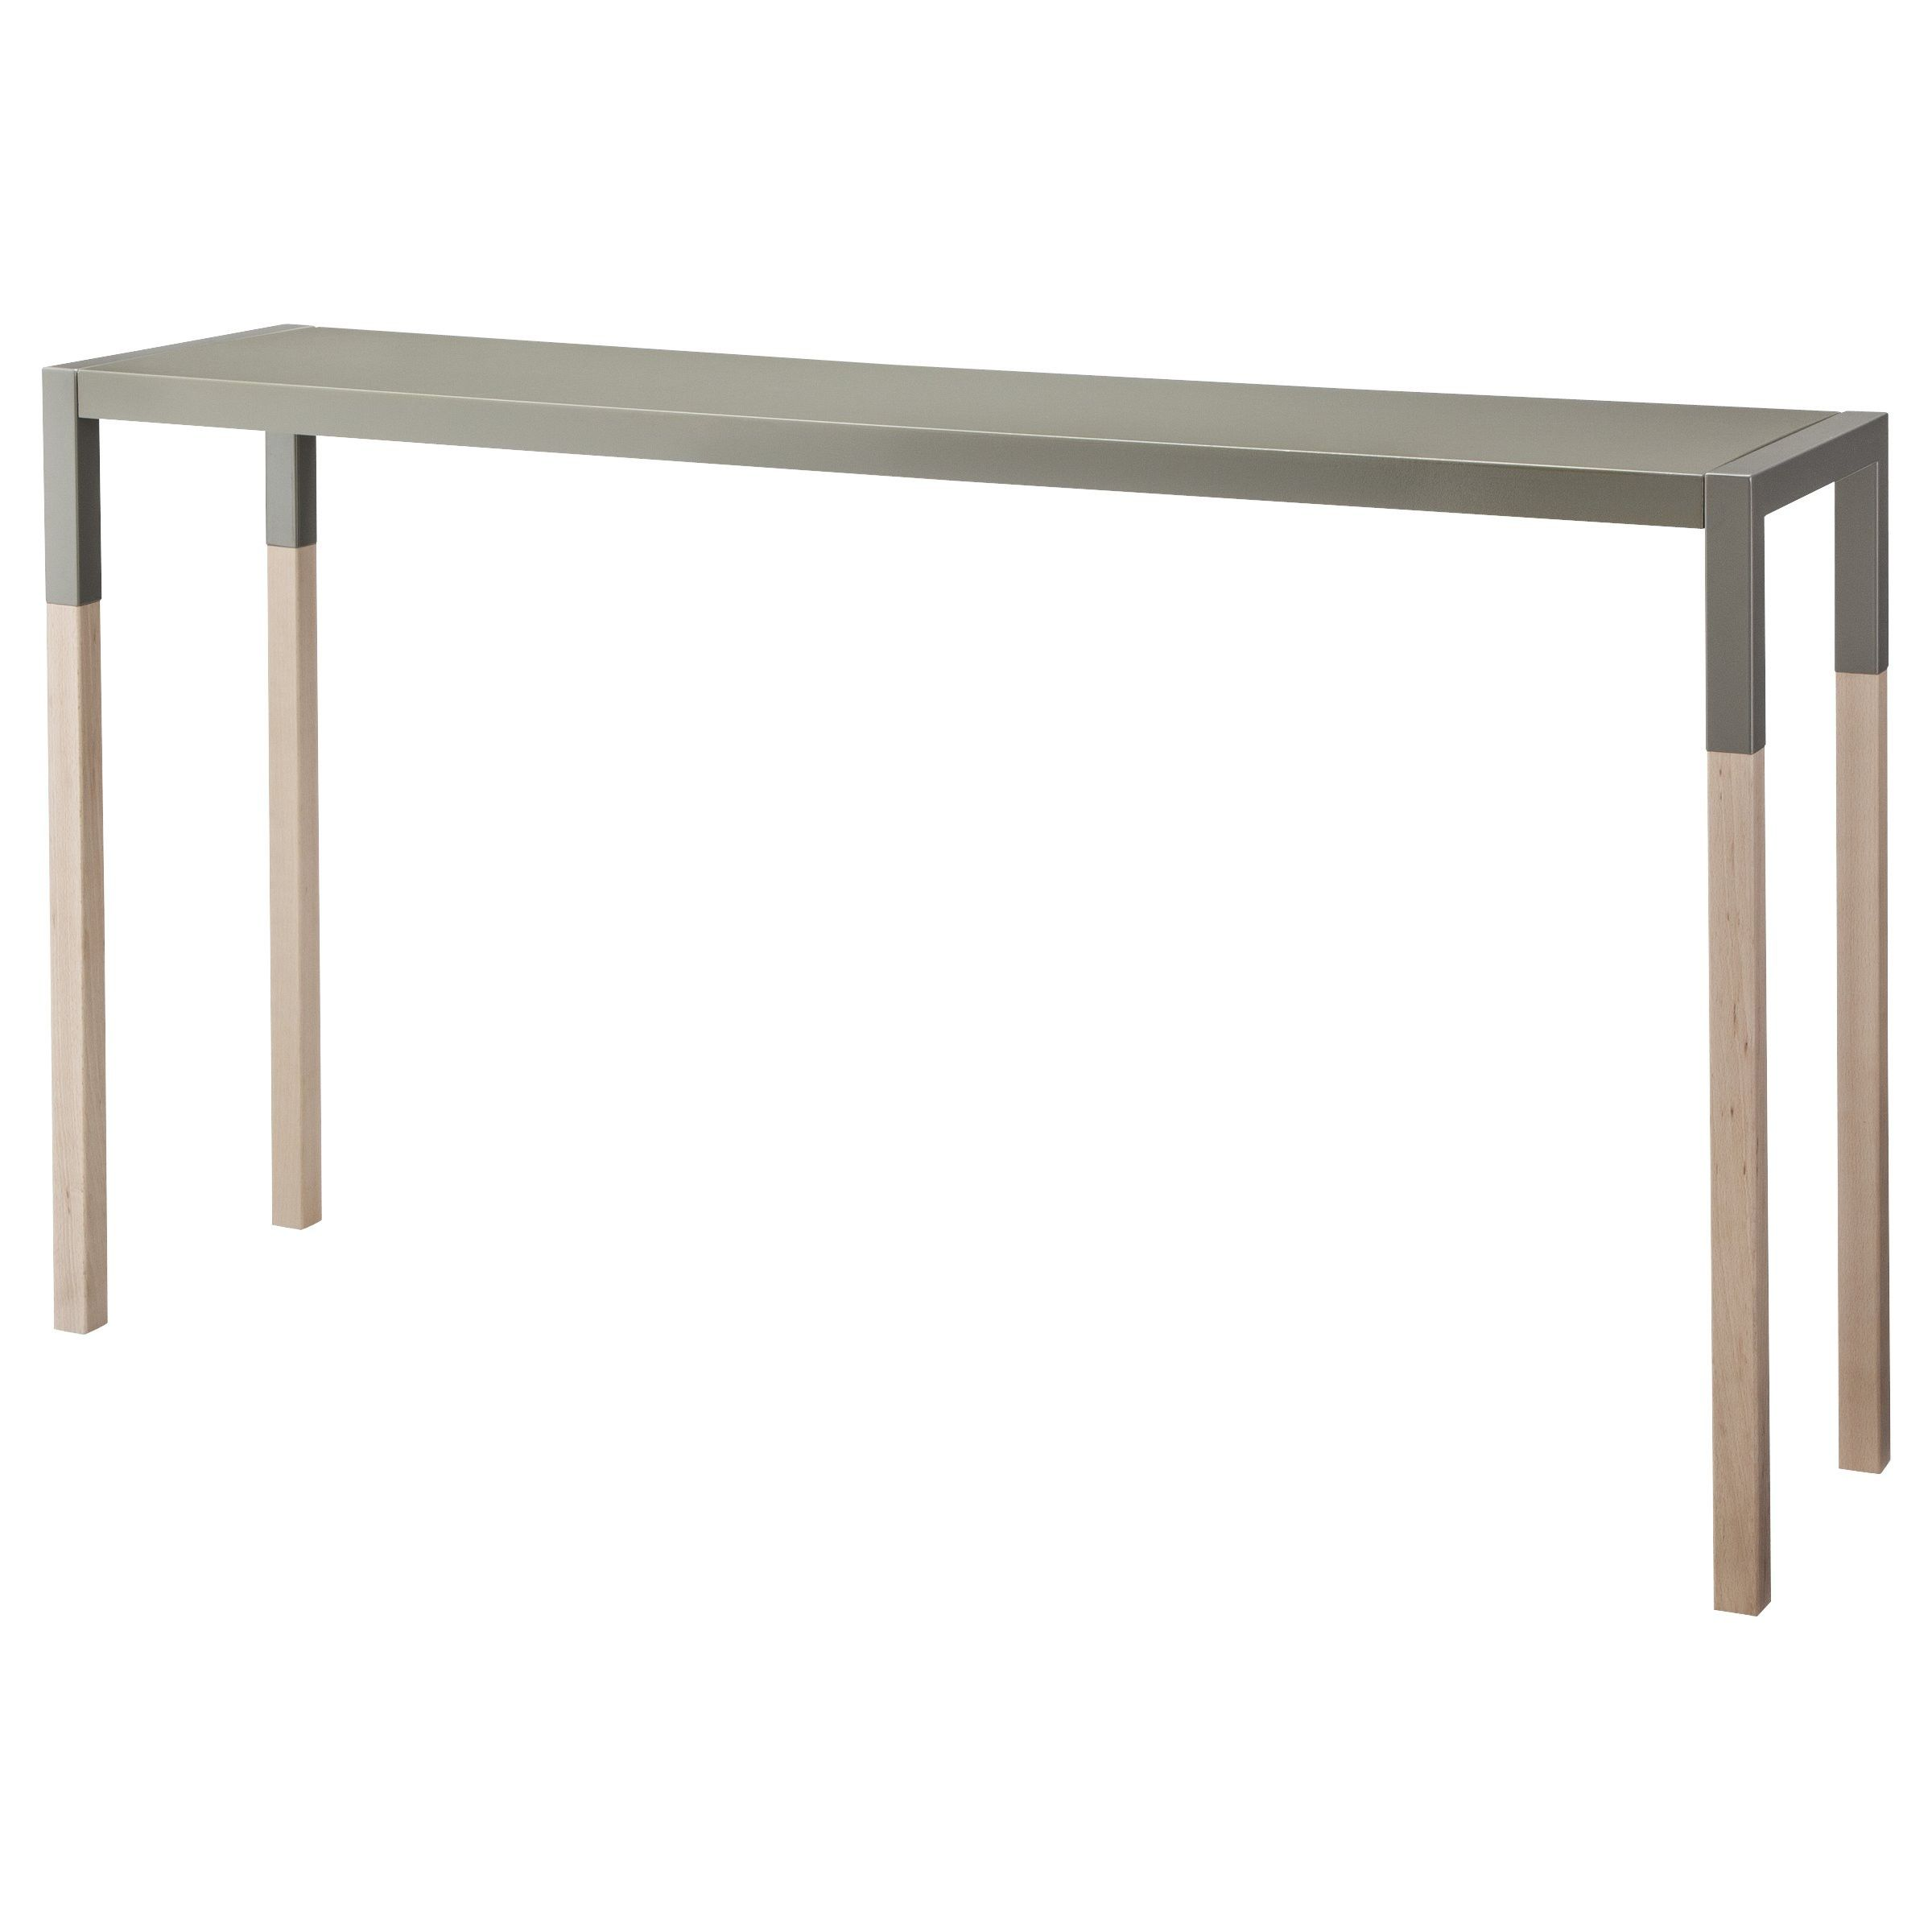 d66b2ce200898212ffac0041661fc9e3 Unique De Table Ikea Ronde Conception